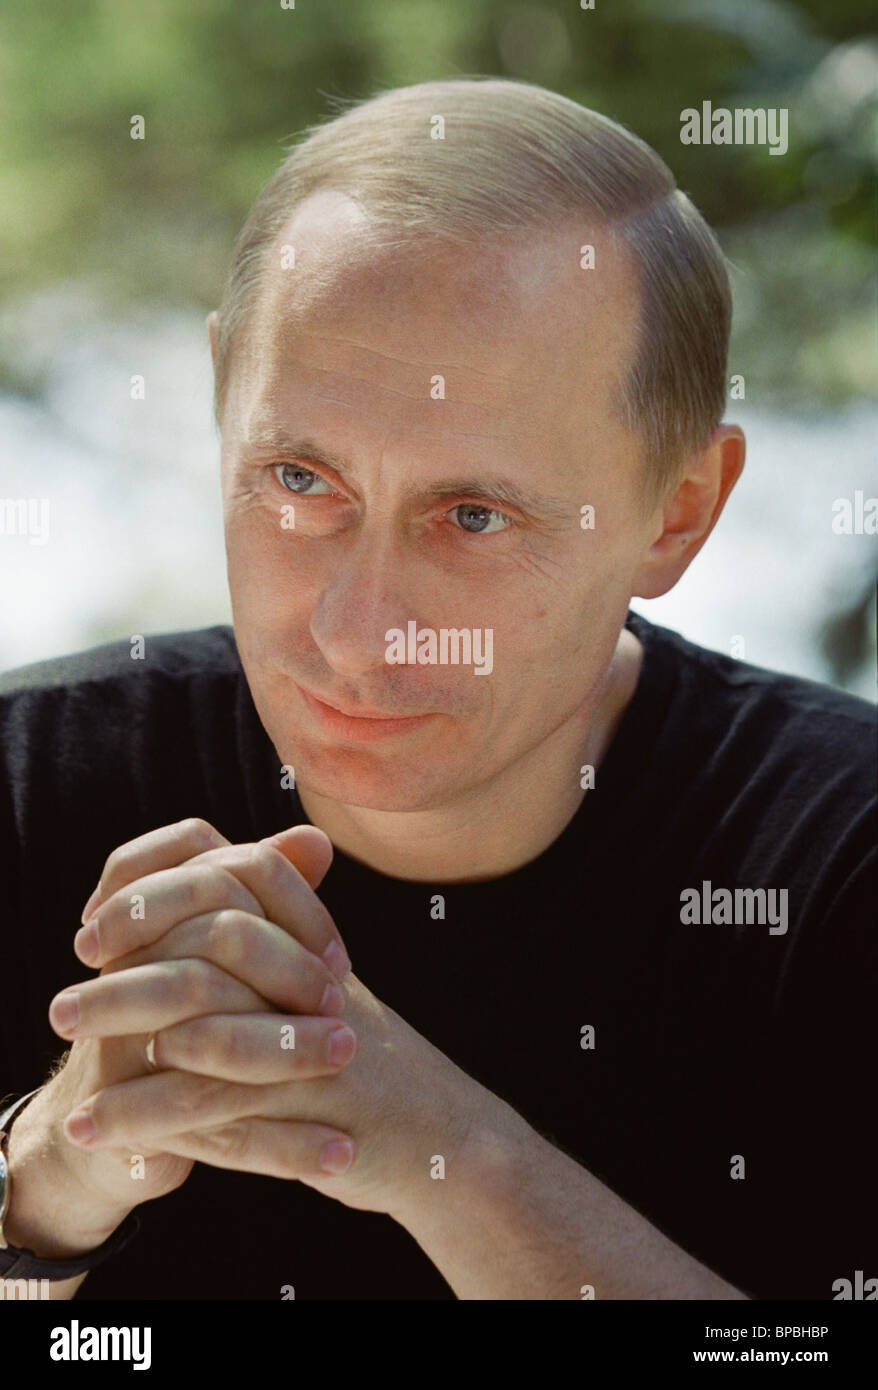 Towards President Putin's jubilee - Stock Image